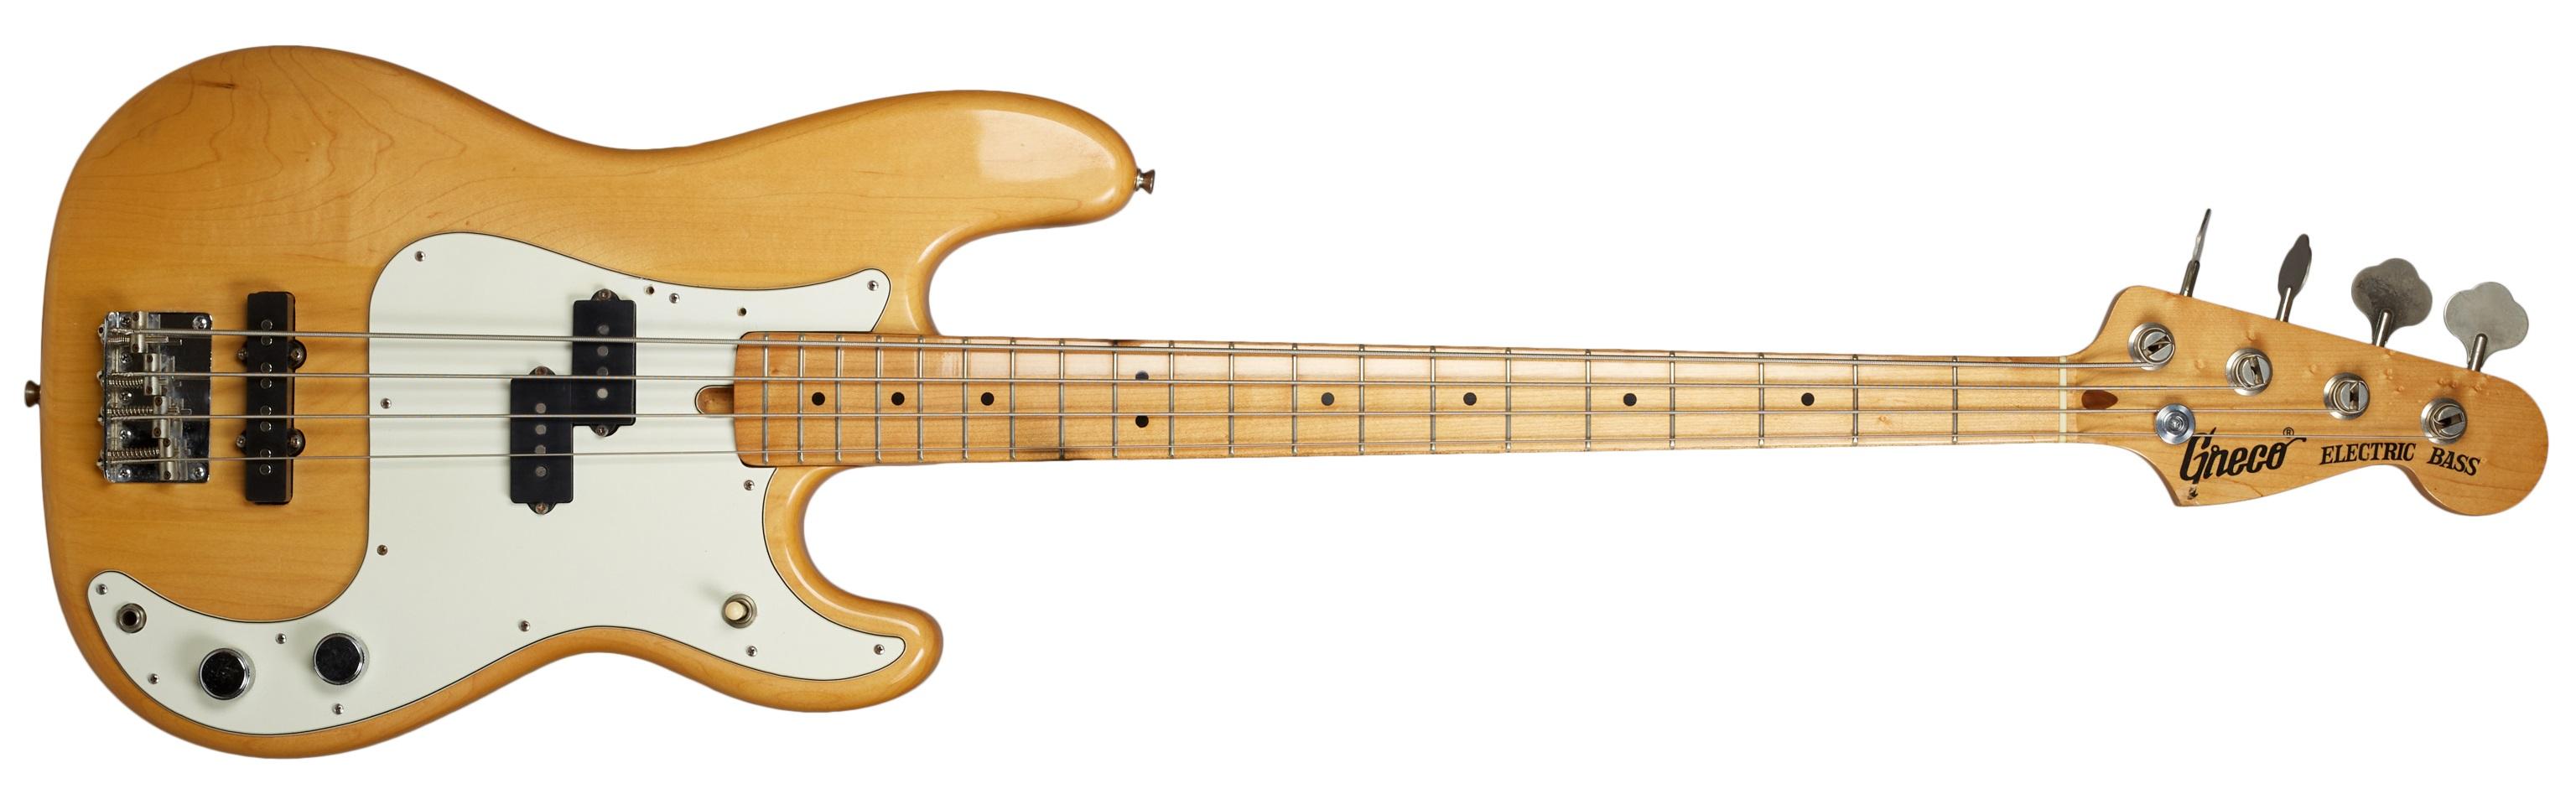 Greco 1974 model PB-750